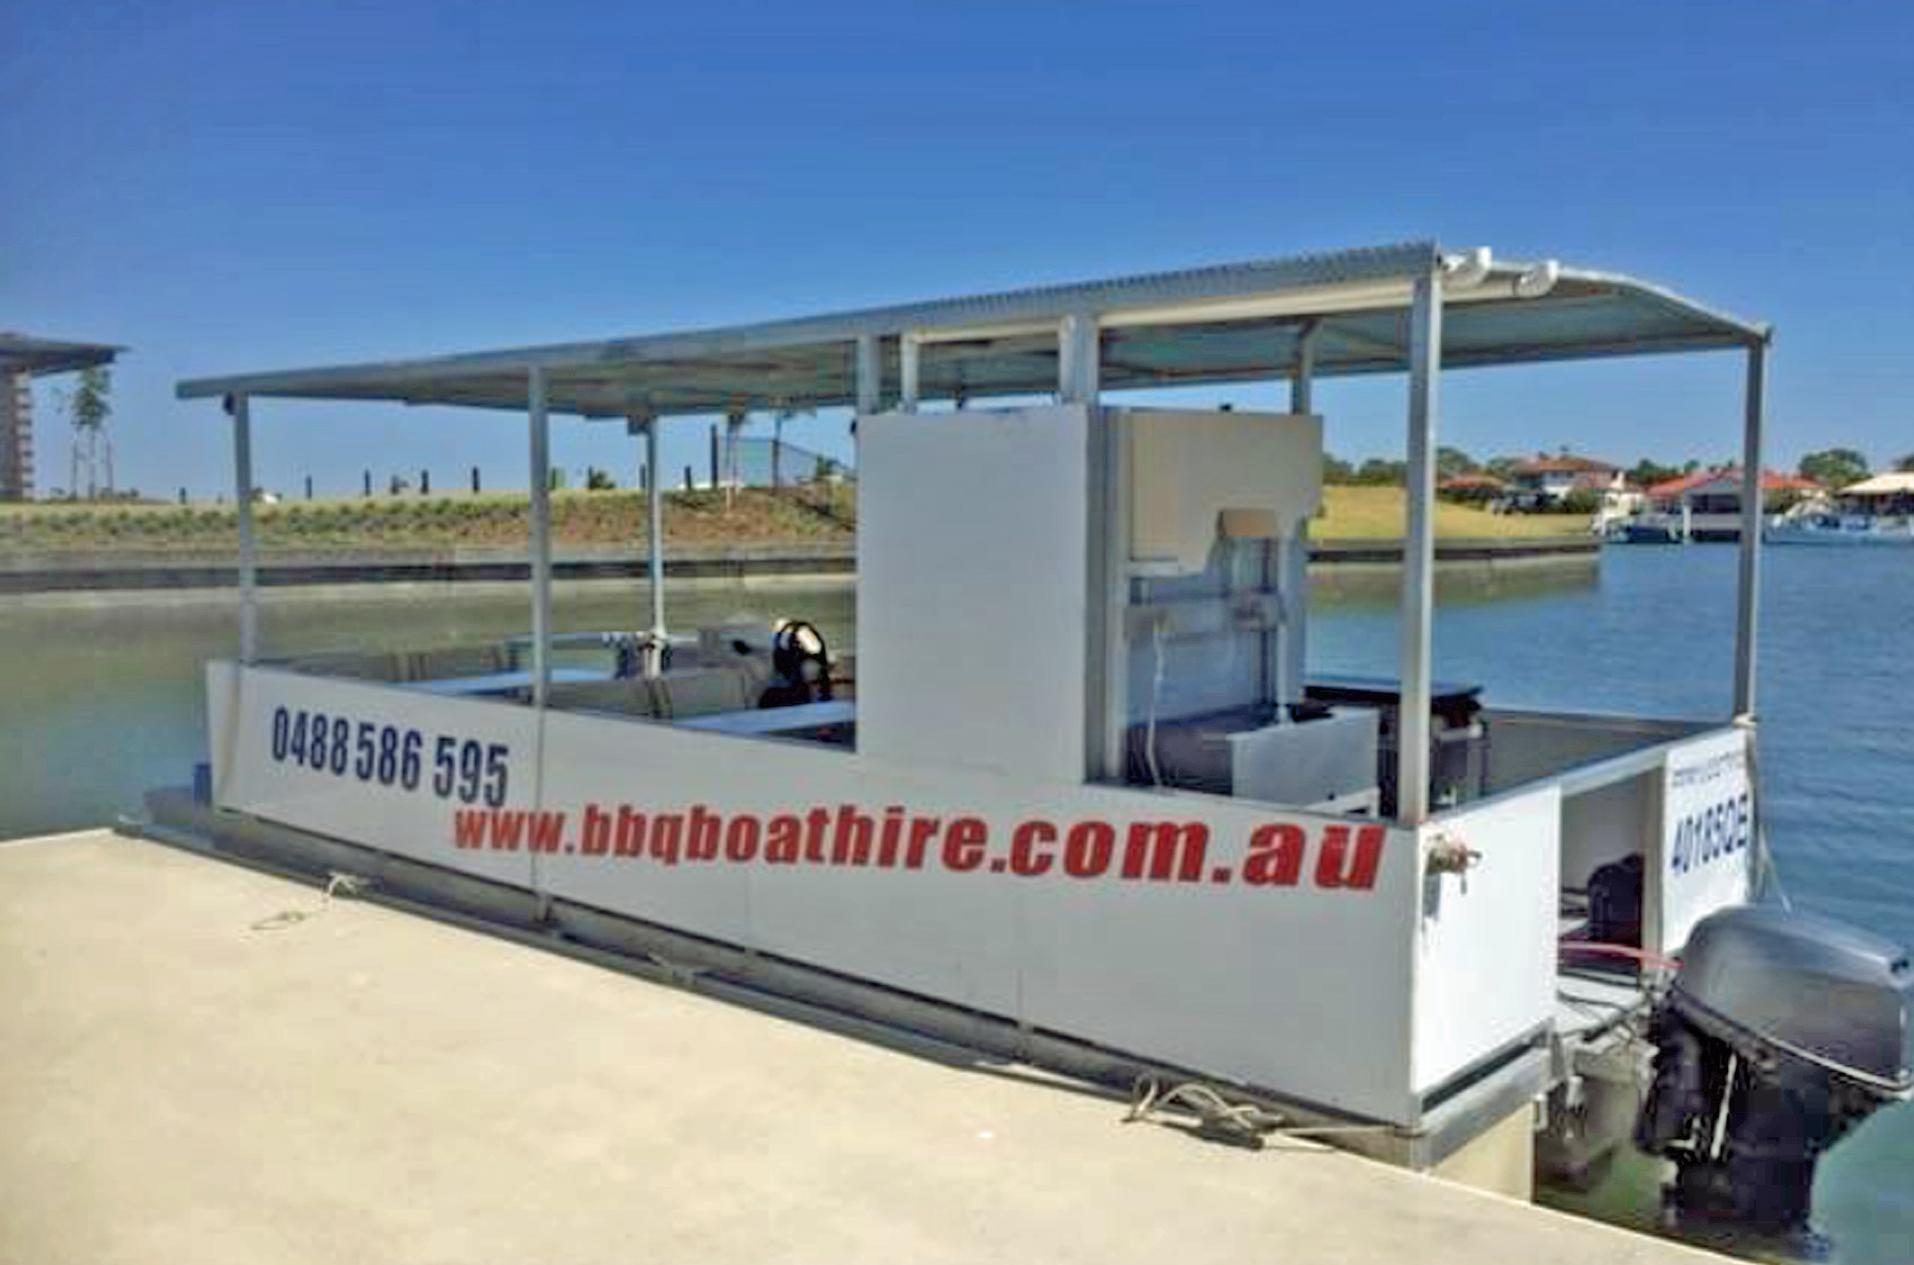 BBQ Boat Hire Bribie Island.jpg